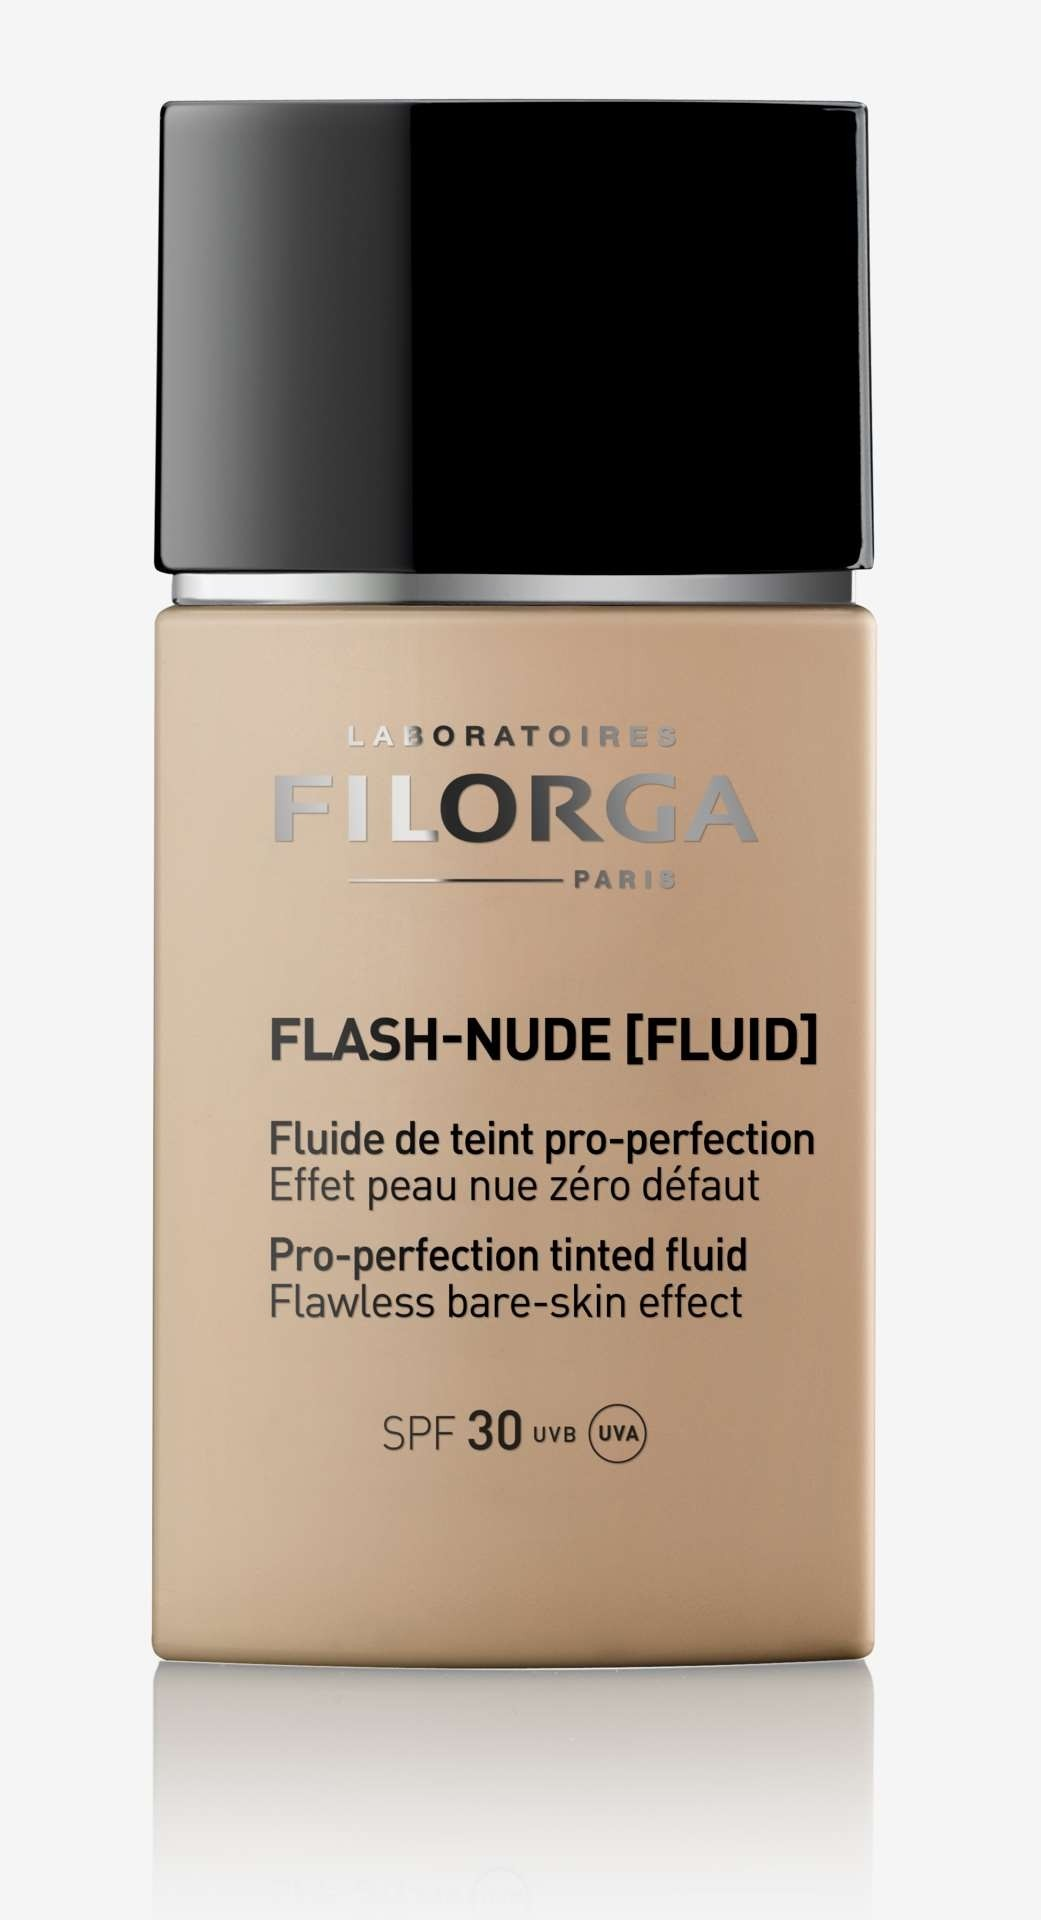 Filorga Flash Nude Fluid Fondotinta 1.5 nude Medium 30ml